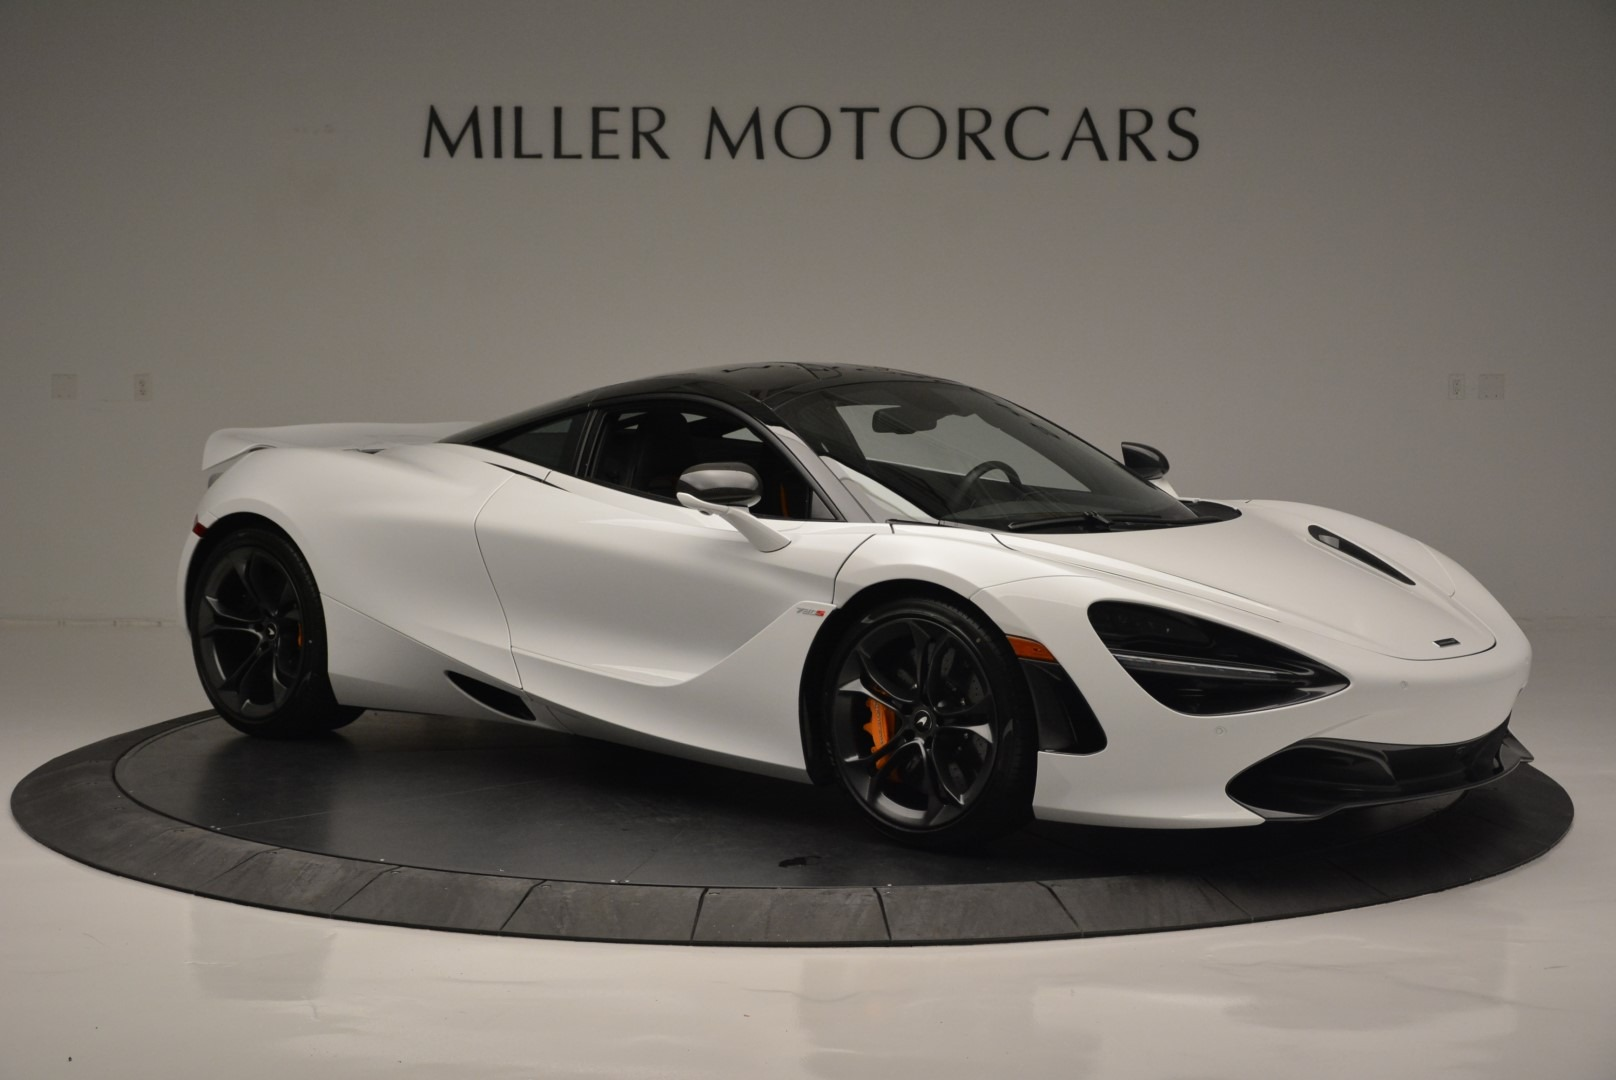 Used 2019 McLaren 720S Coupe For Sale In Westport, CT 2543_p10